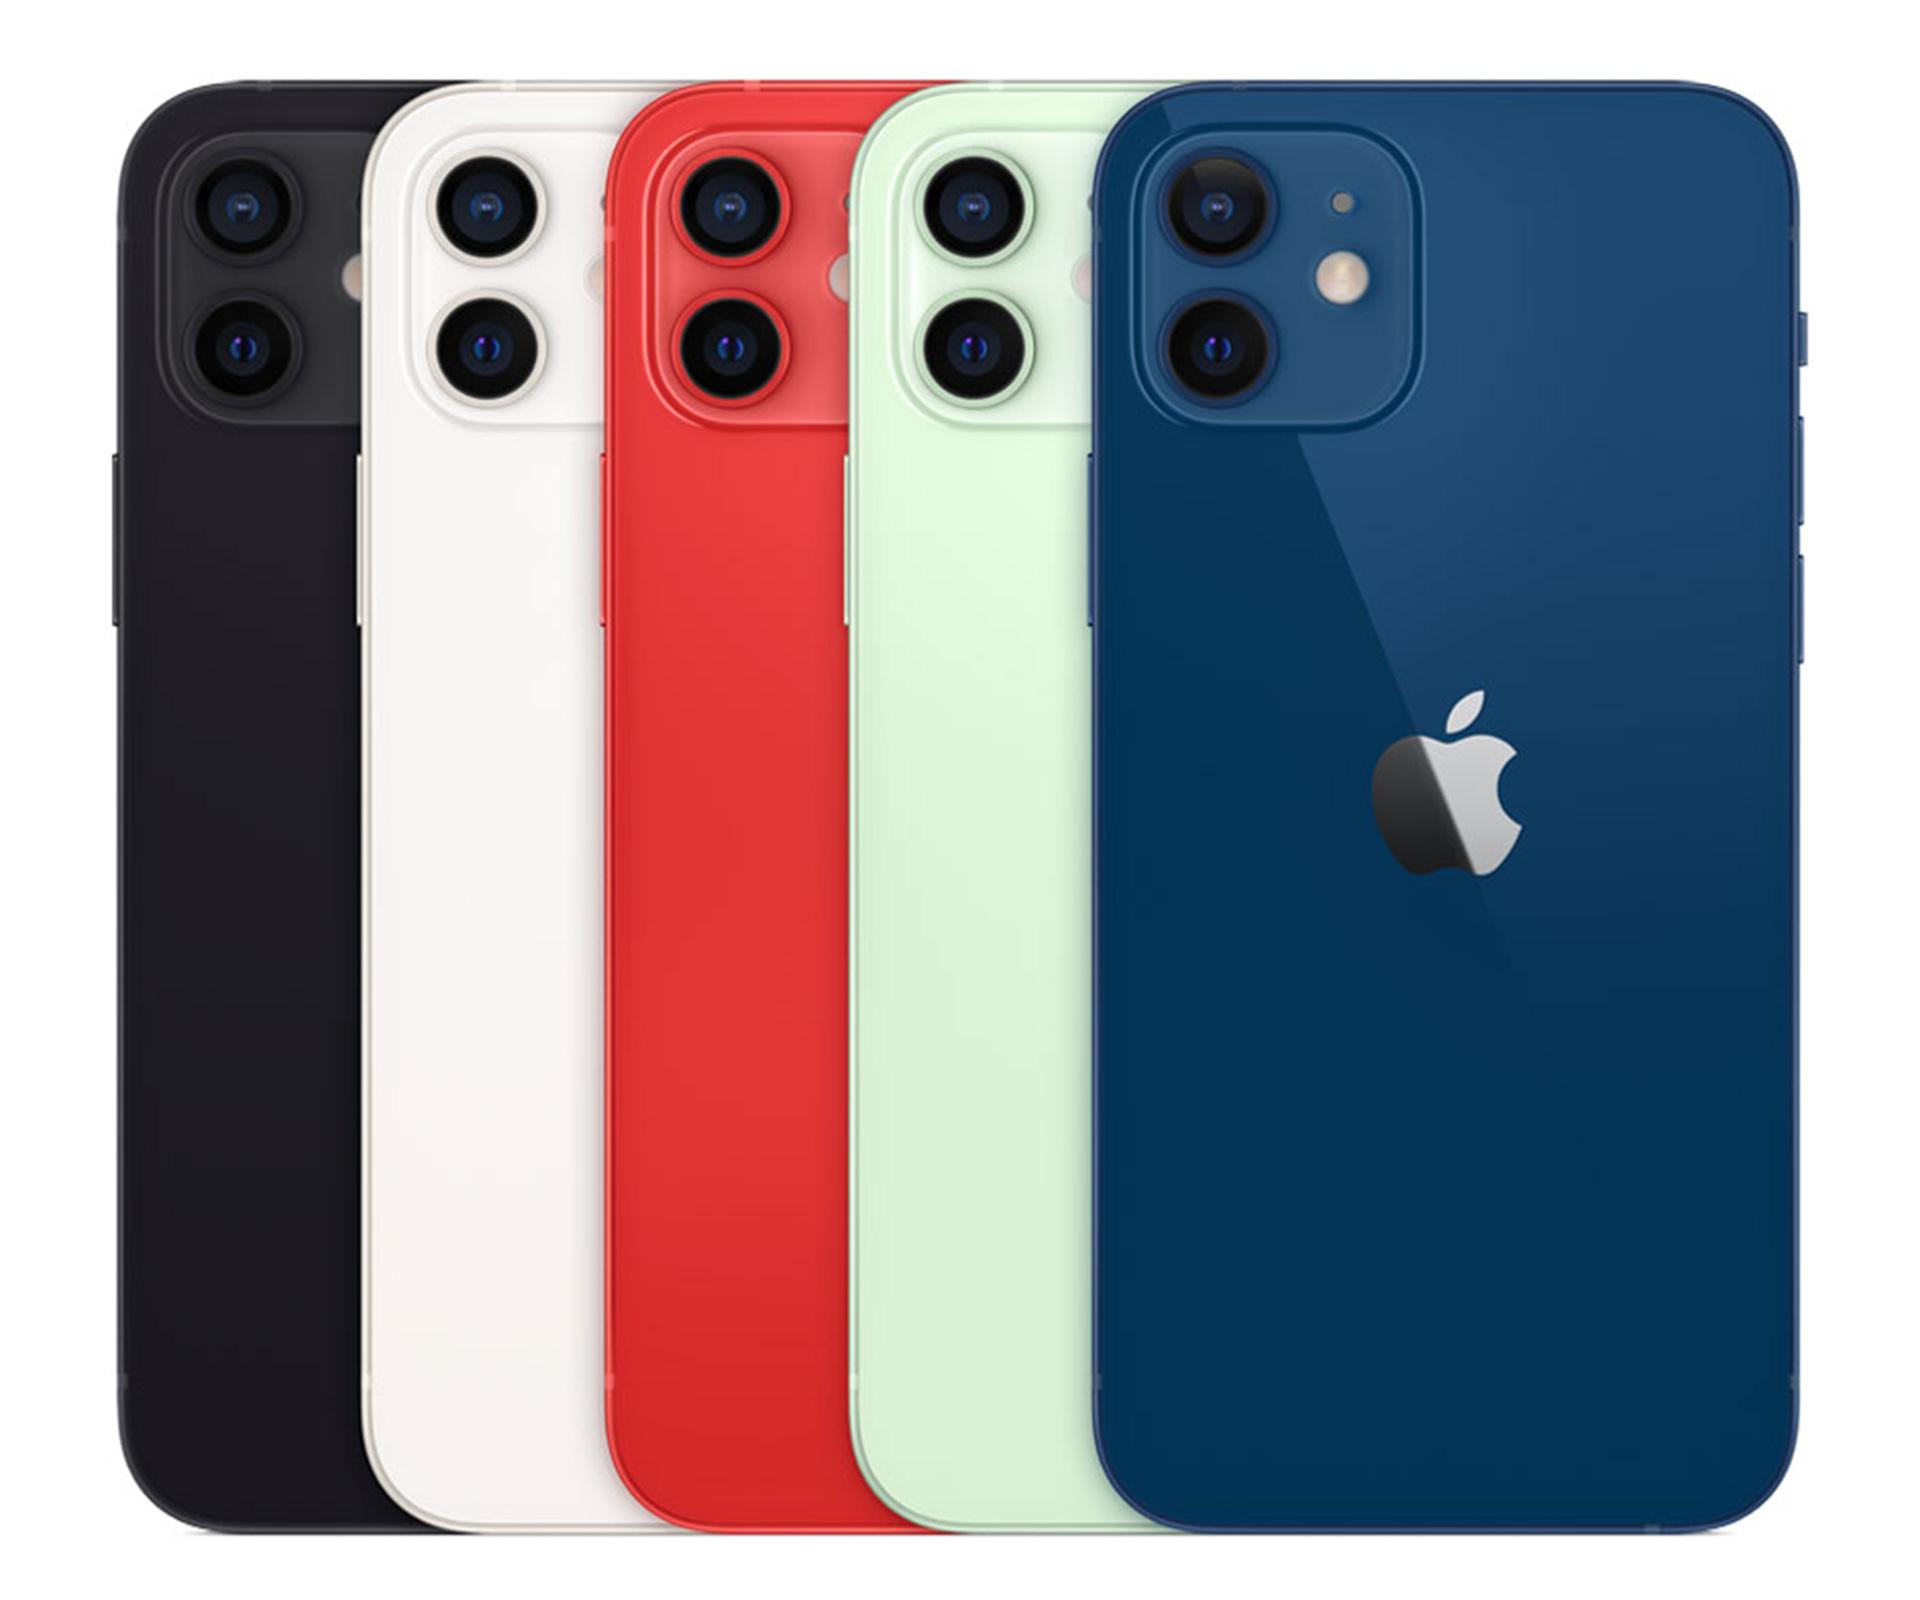 [Telekom Young M1] Apple iPhone 12 (64 GB) für 1 € im MagentaMobil S (15 GB 5G/LTE) + 29,95 € mtl.